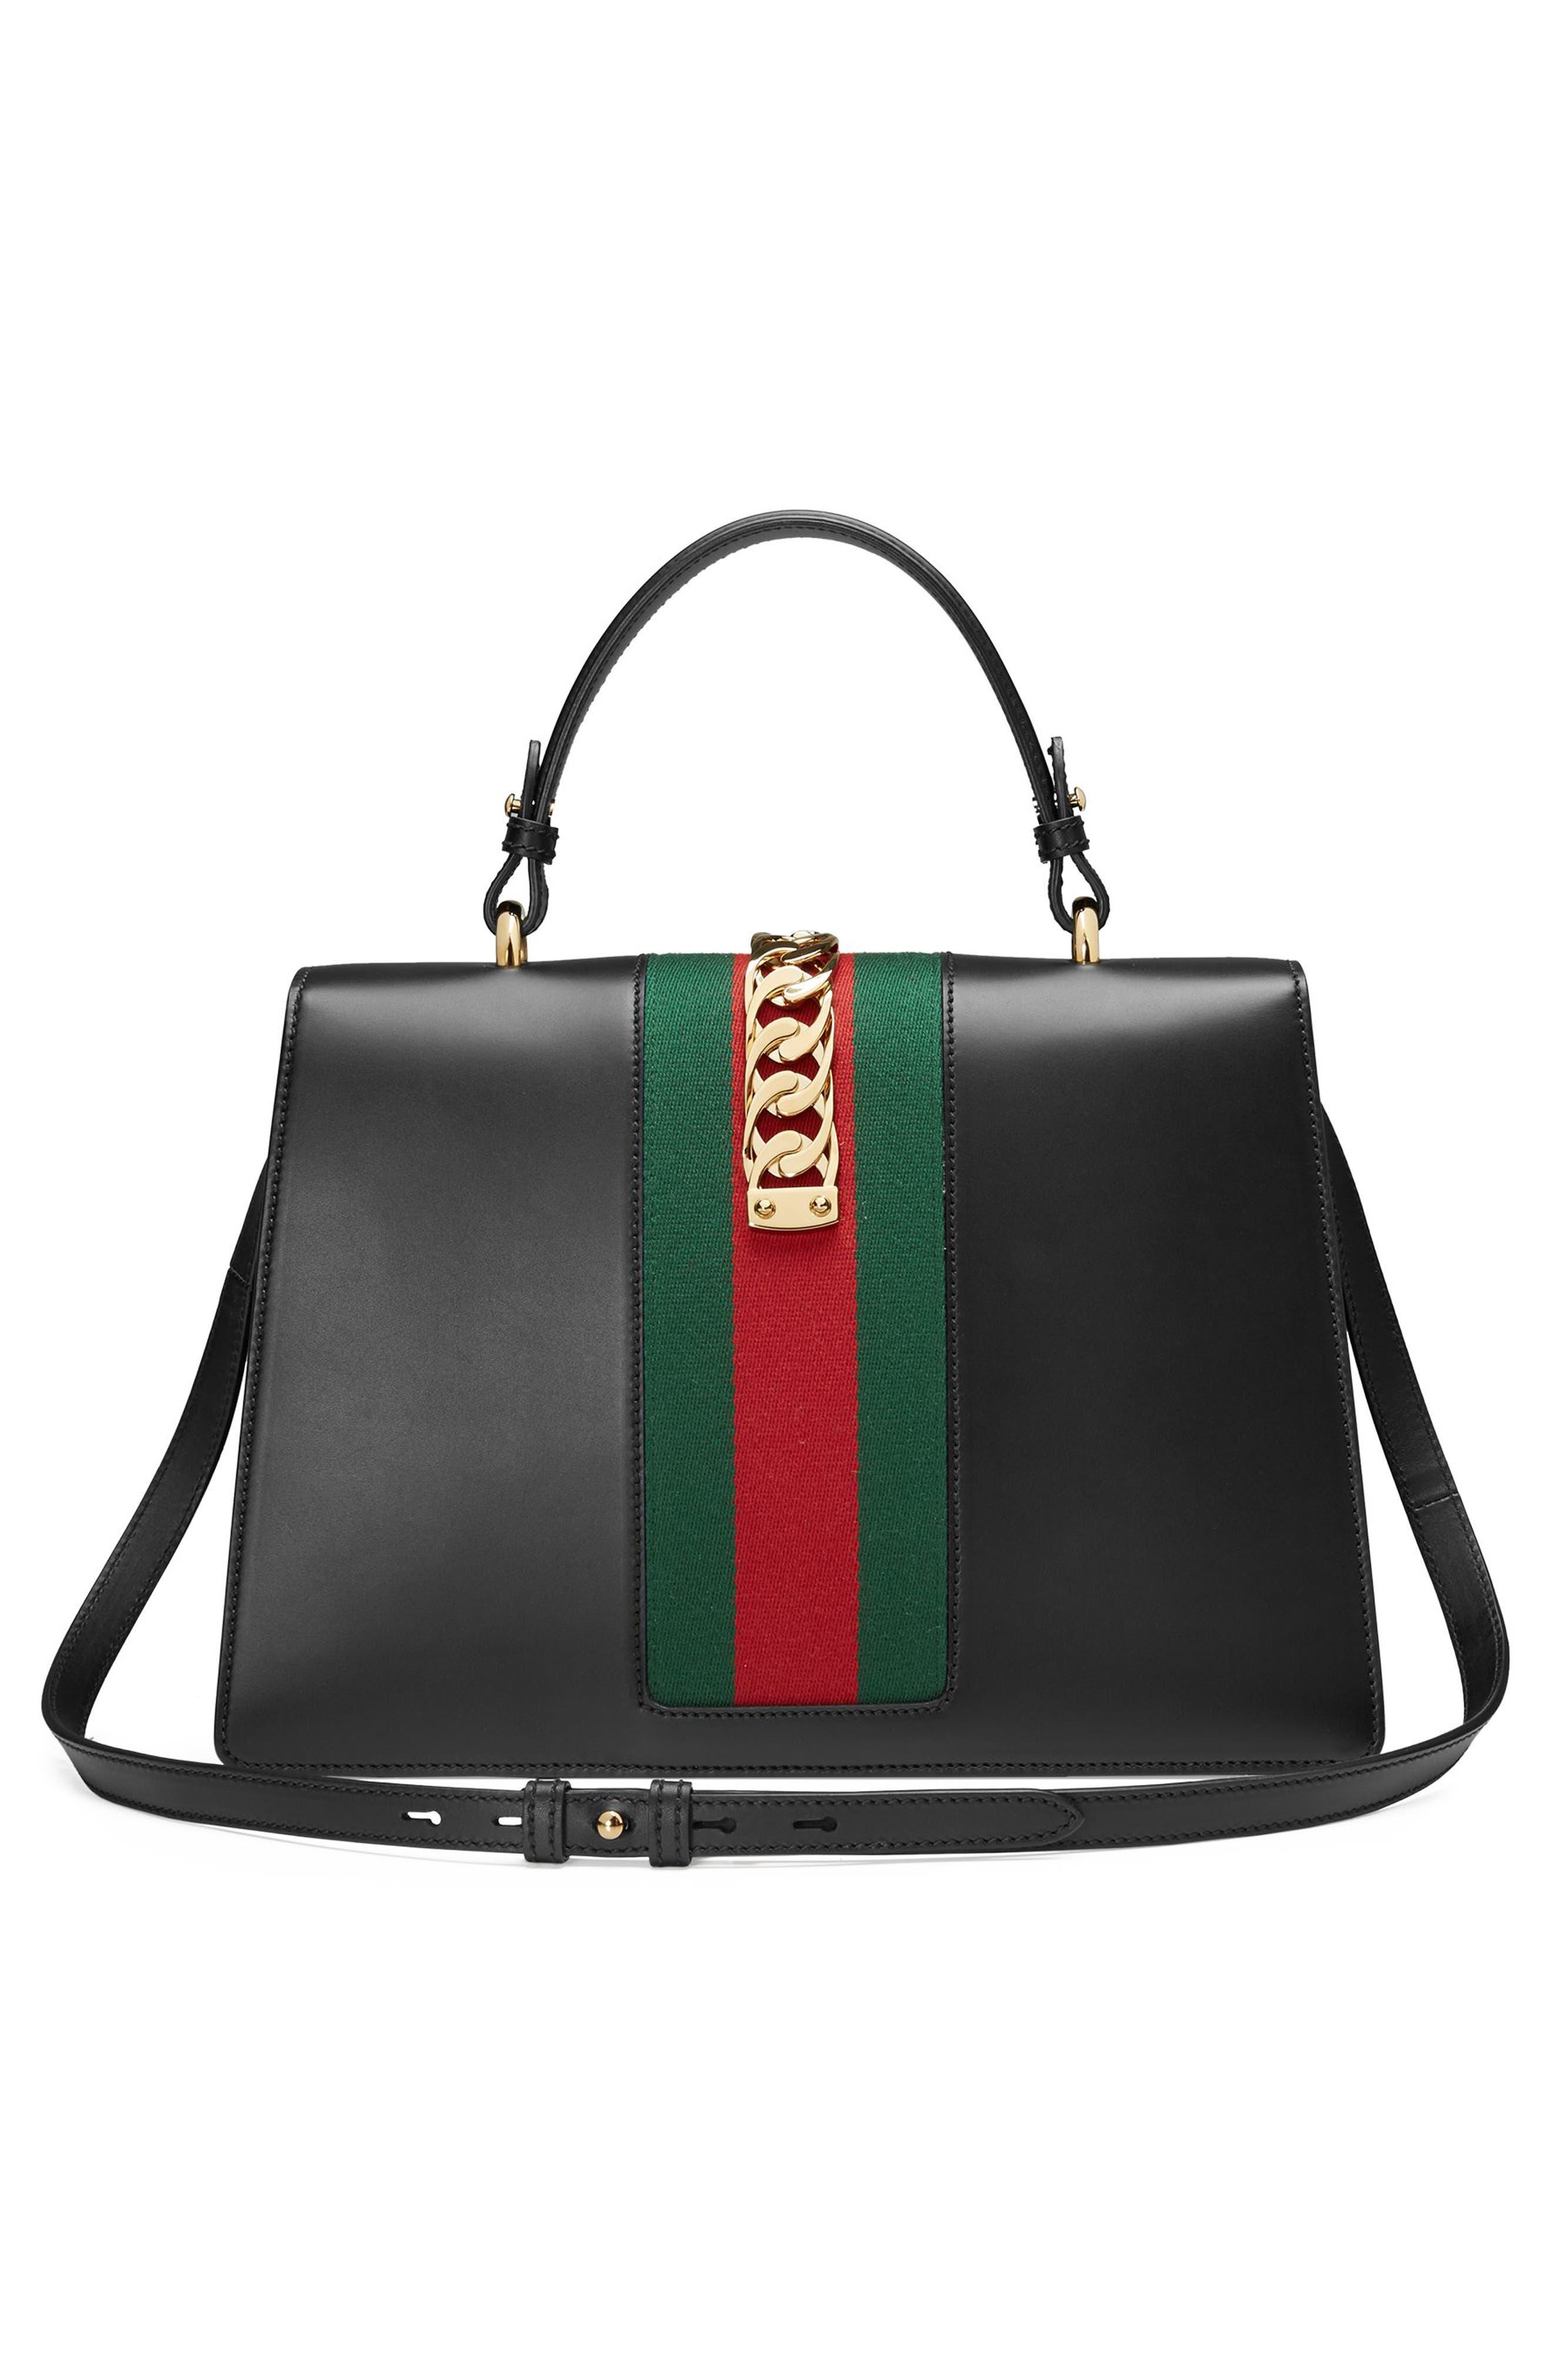 Sylvie Top Handle Leather Shoulder Bag,                             Alternate thumbnail 2, color,                             NERO/VRV